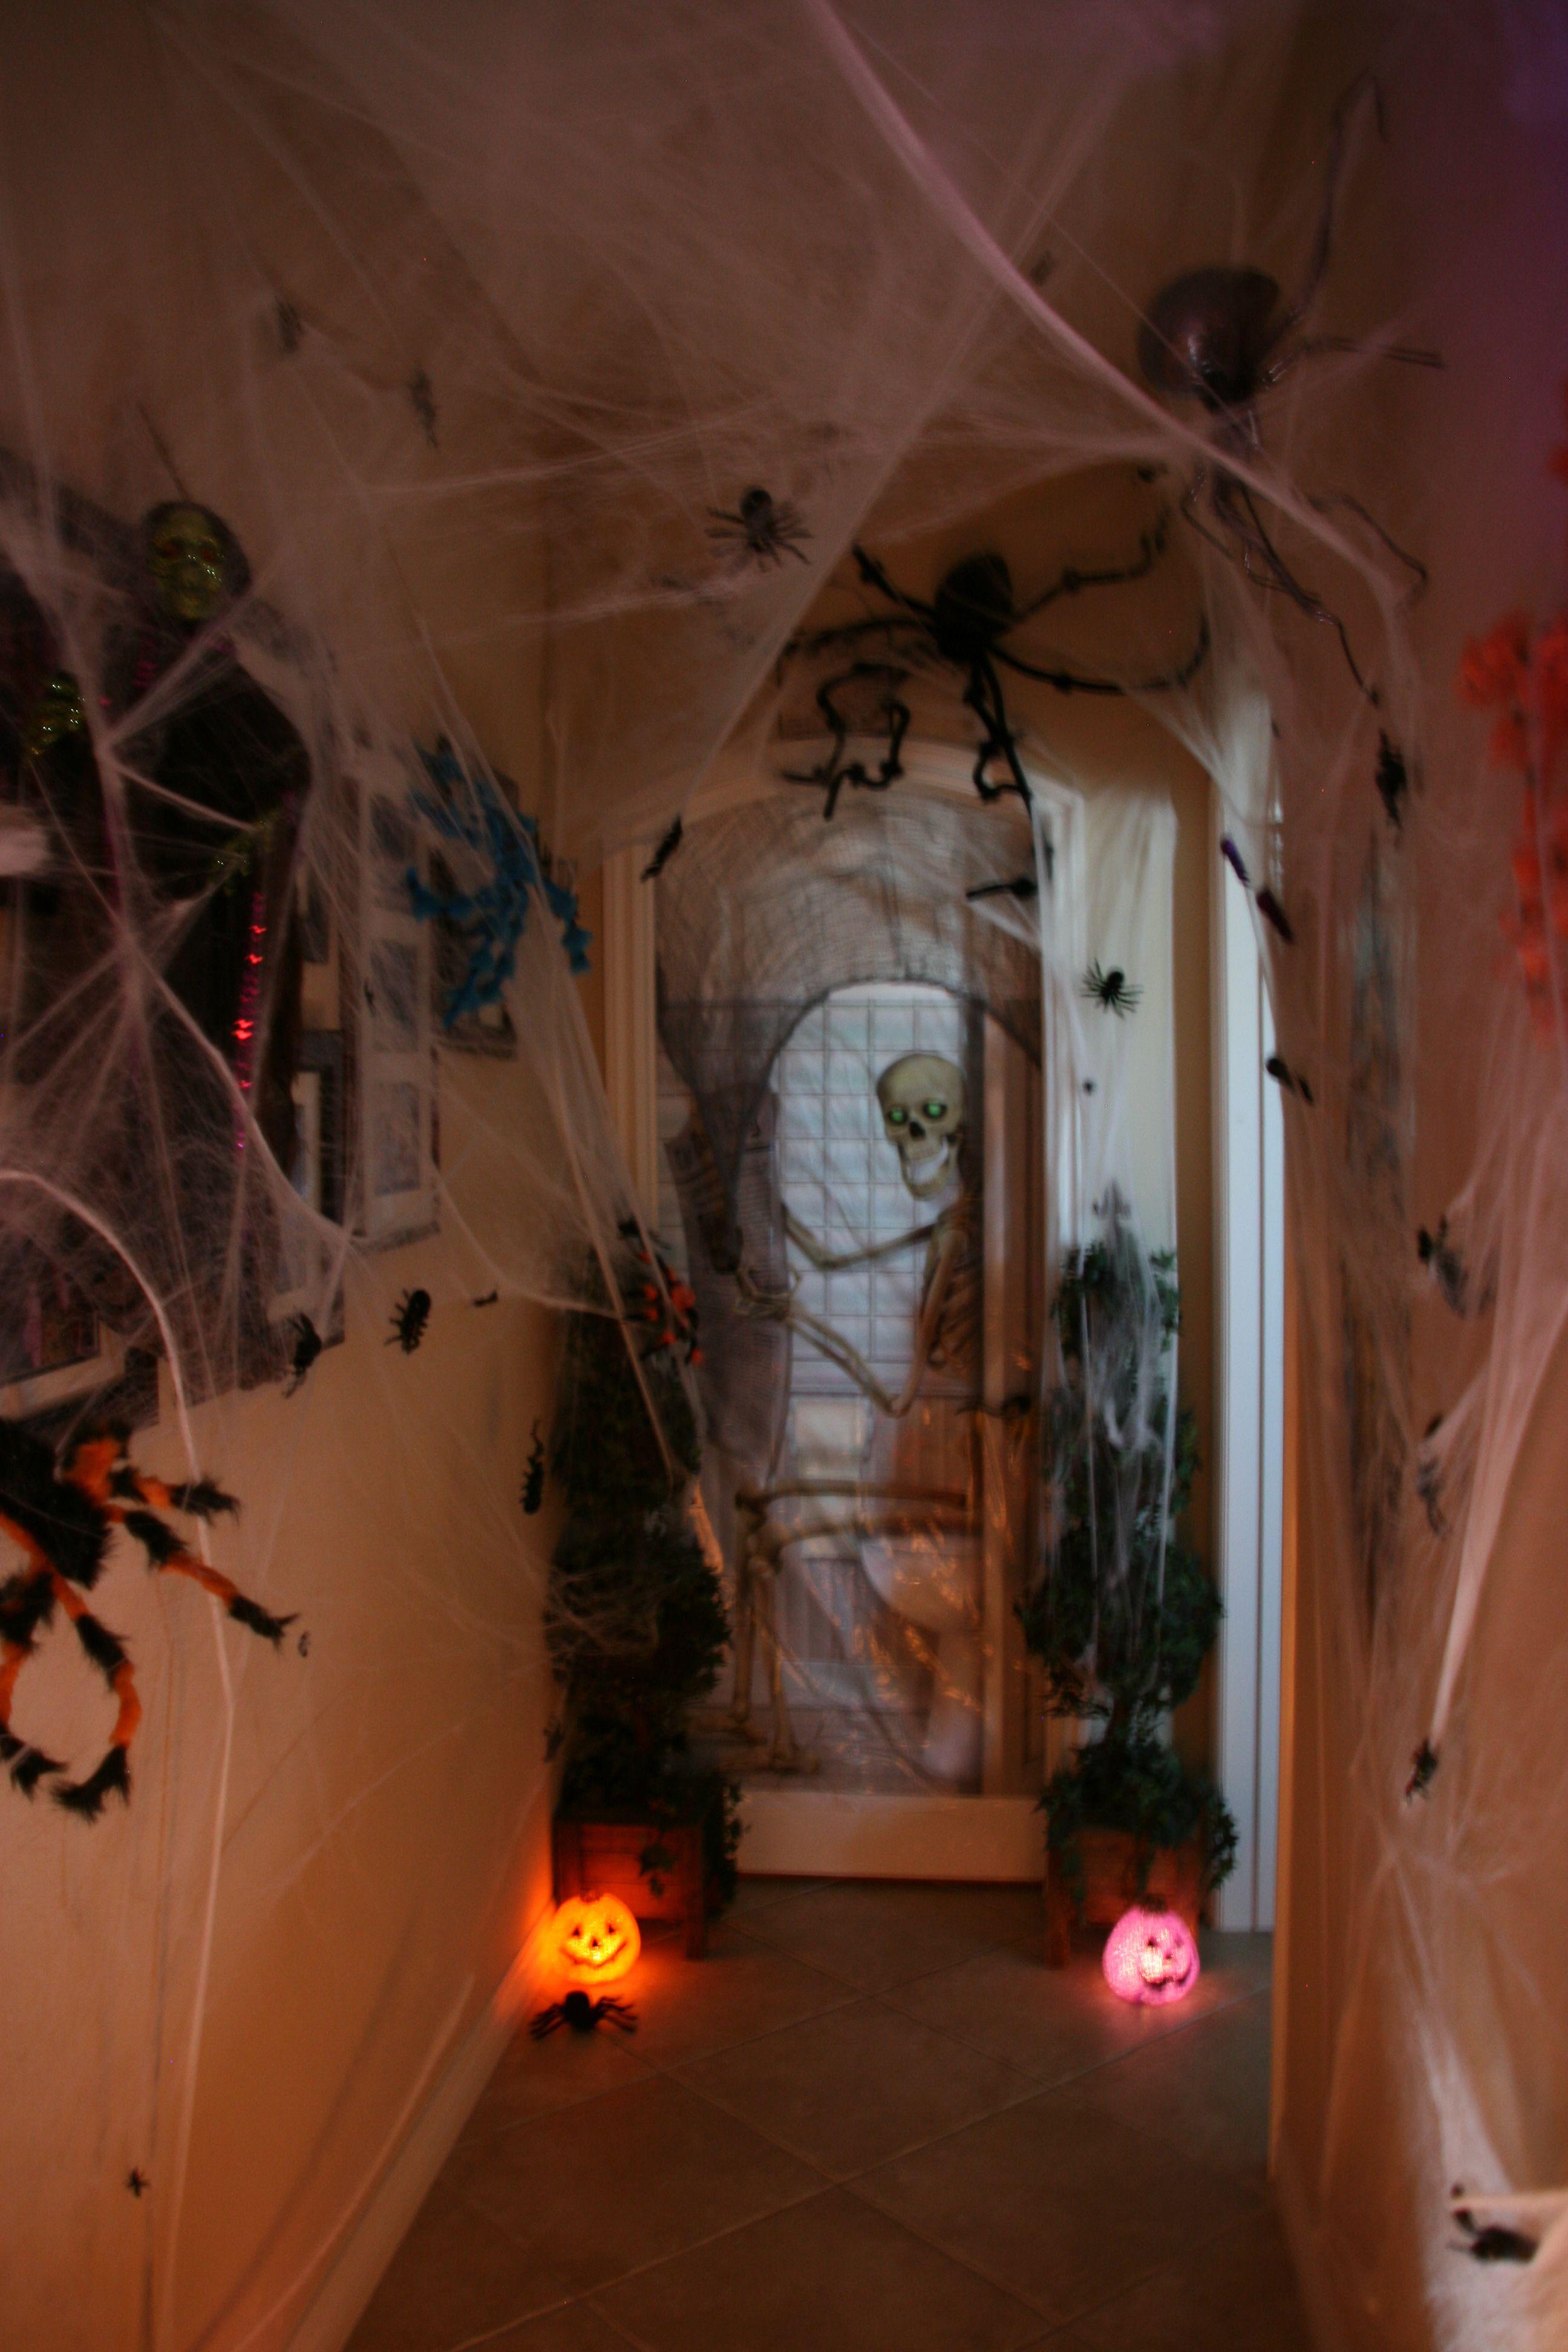 Hall way to bathroom. Spider webs and Spiders. Halloween